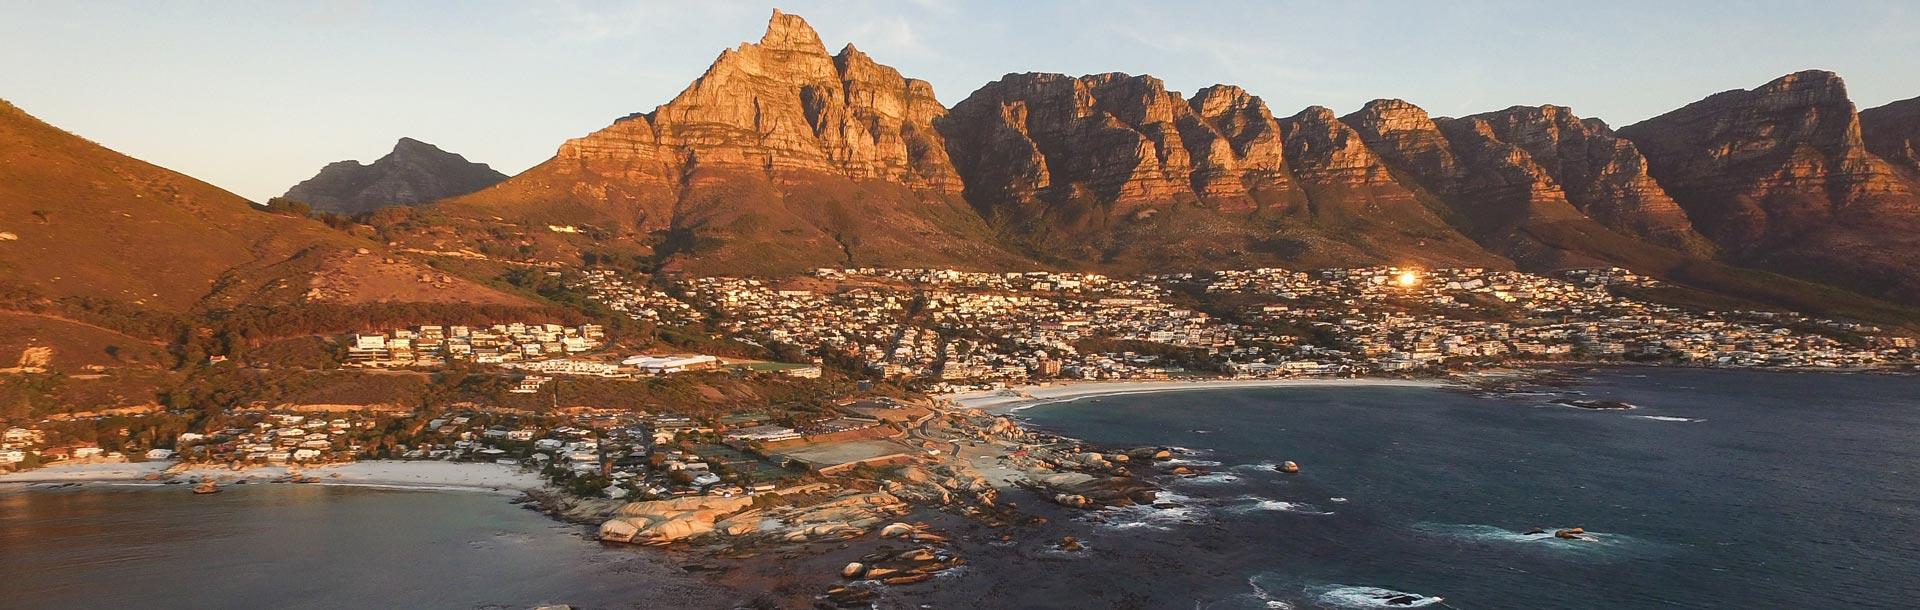 Montagnes de Cape Town vu de la mer